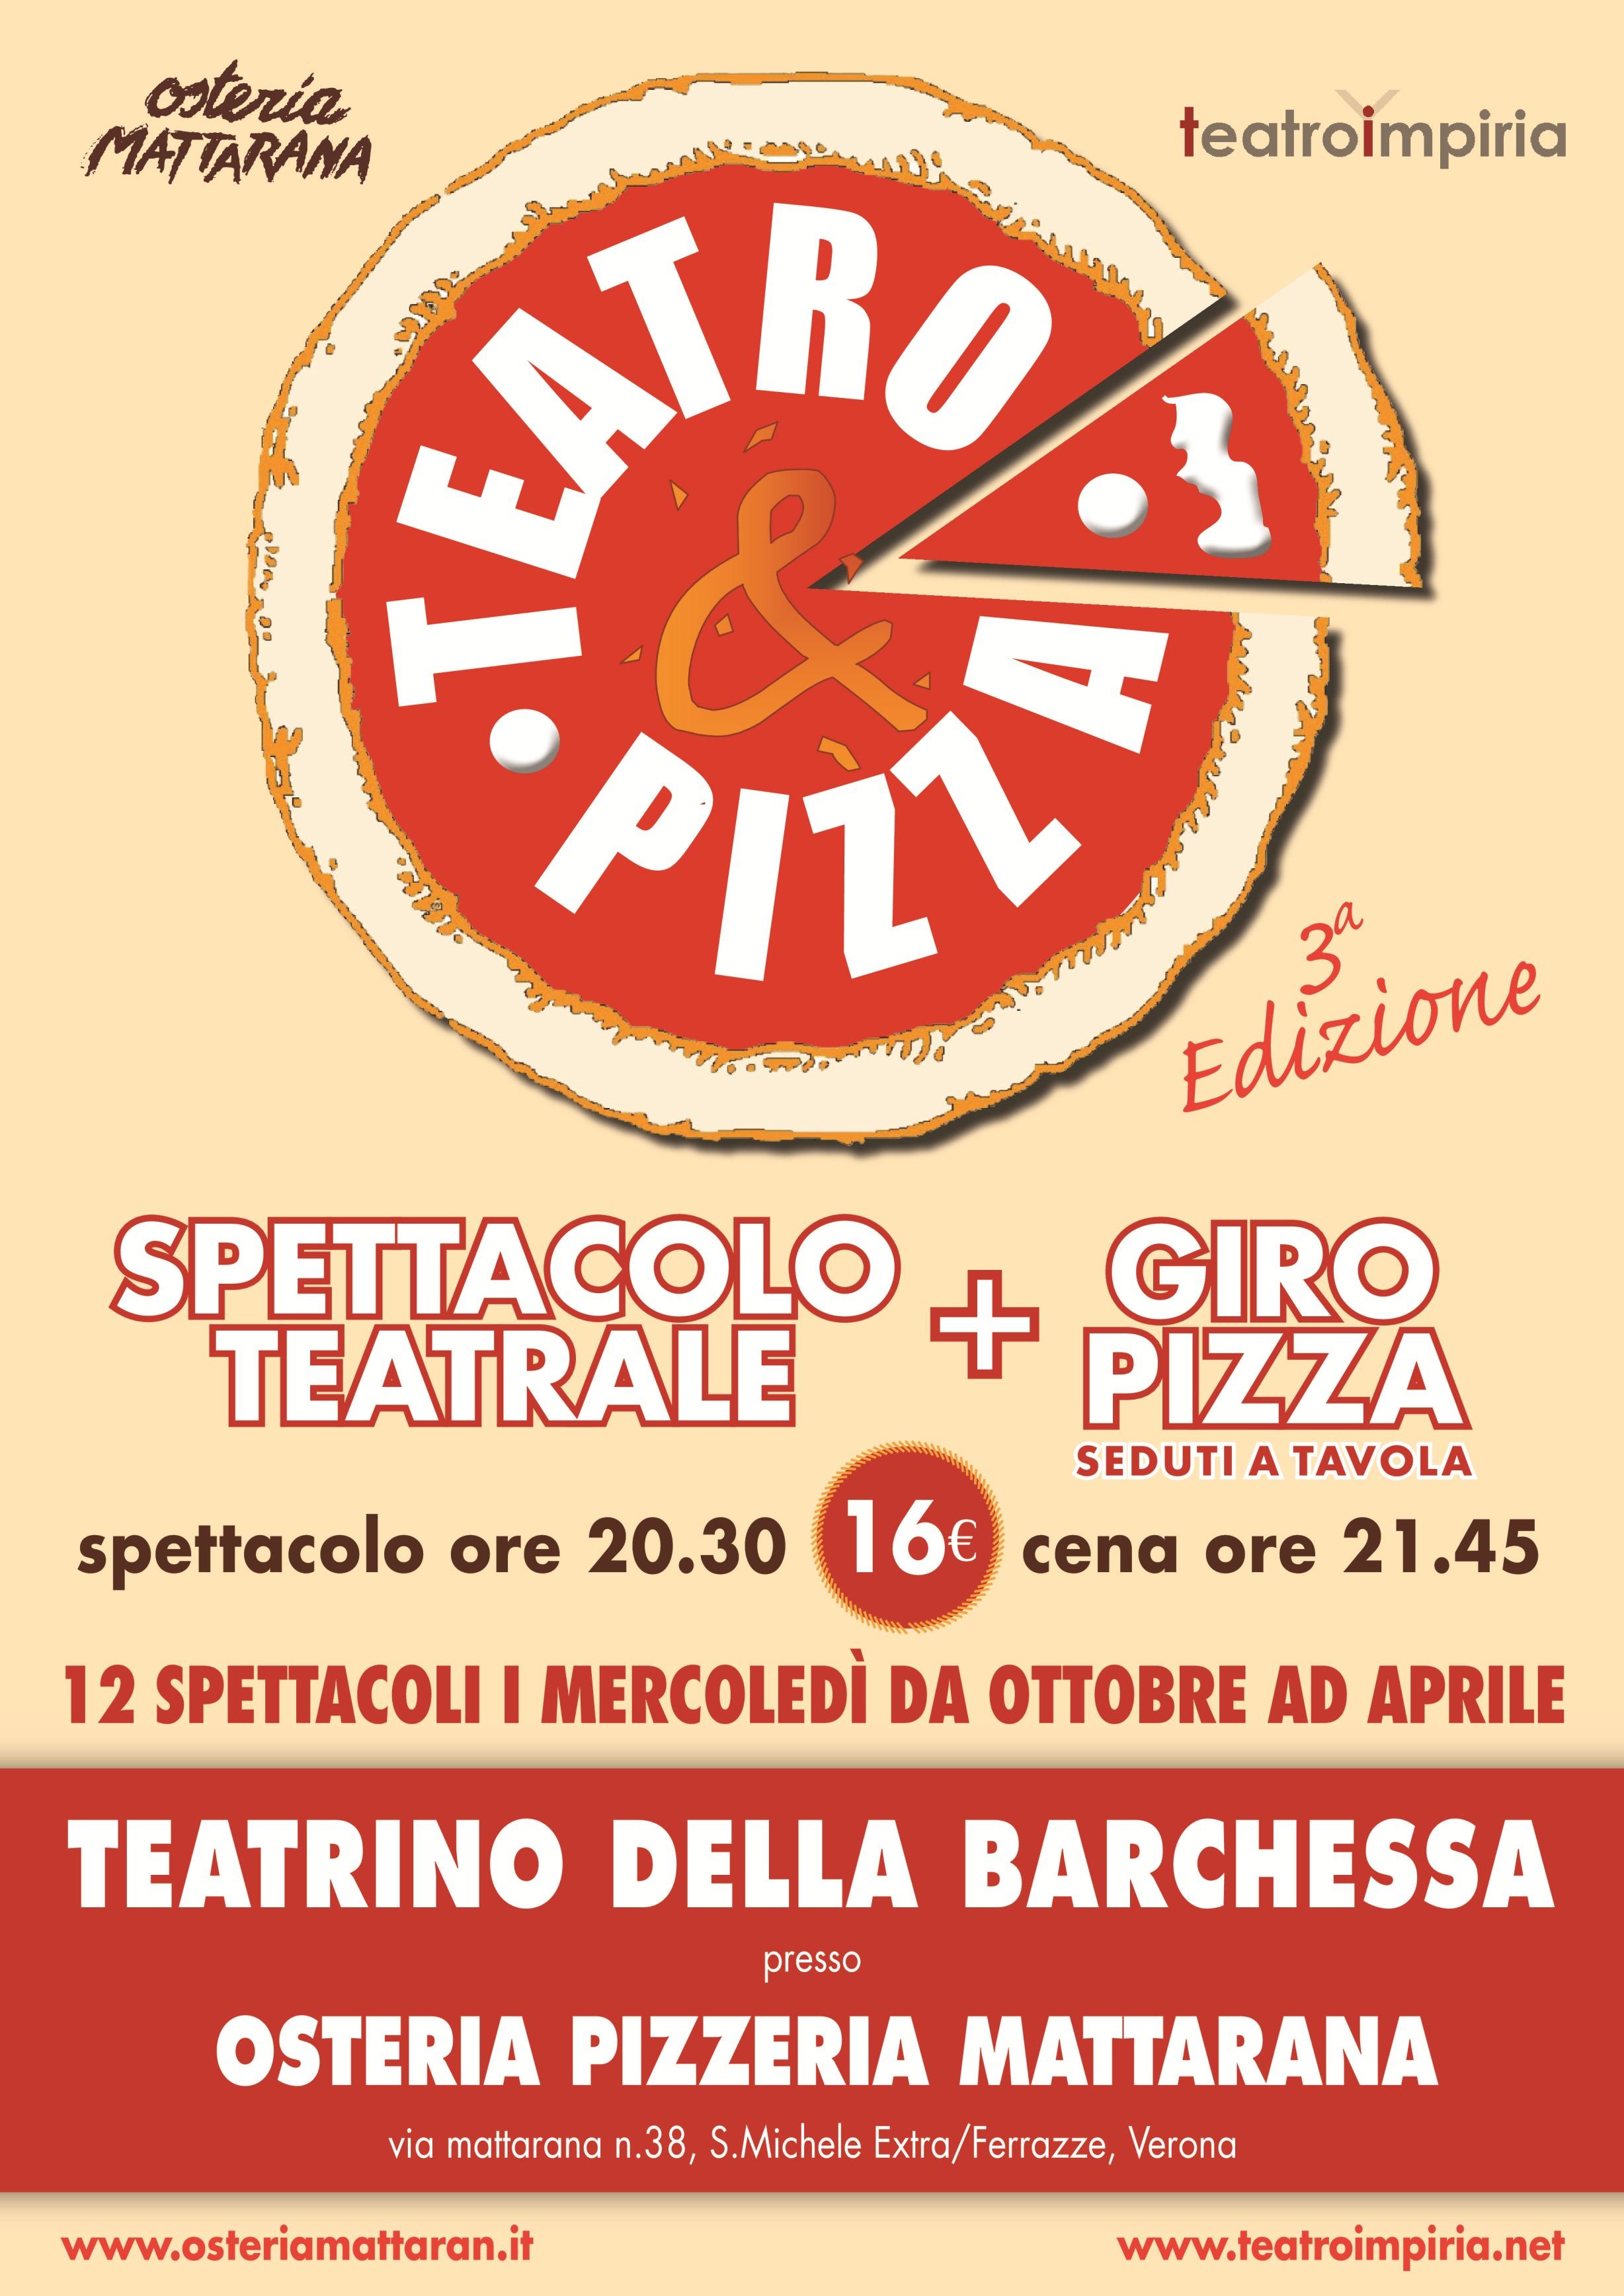 teatro-impiria-verona-pizza-osteria-pizzeria-mattarana